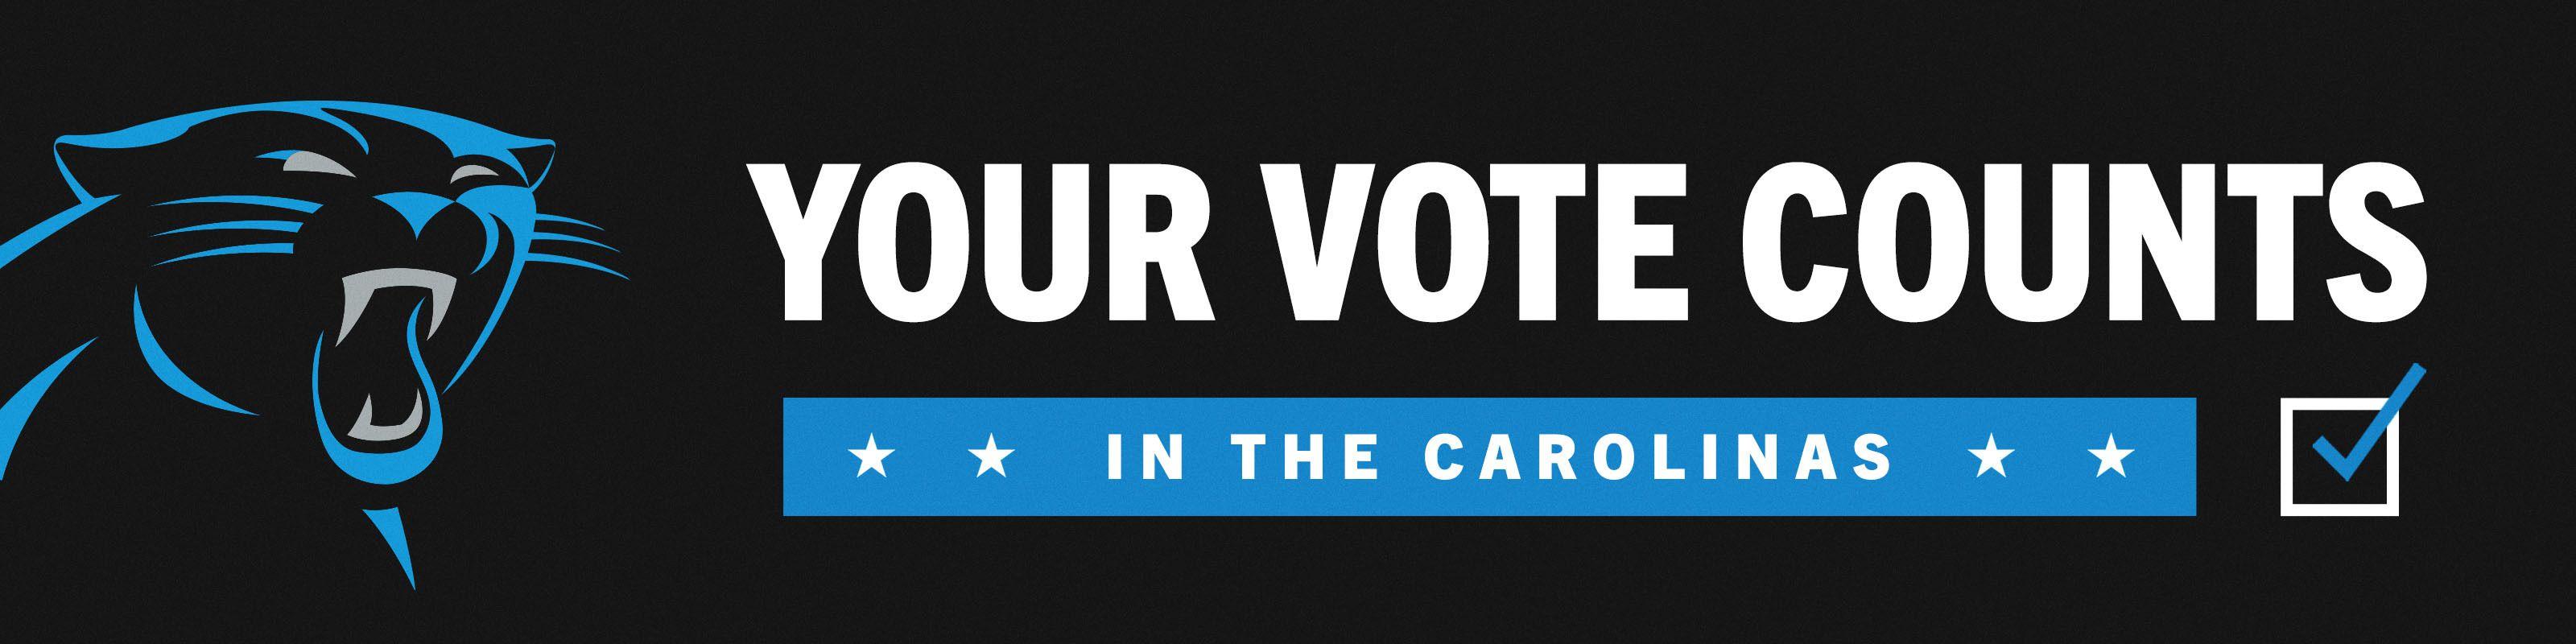 VotingRegistration16 x 4 (V2)